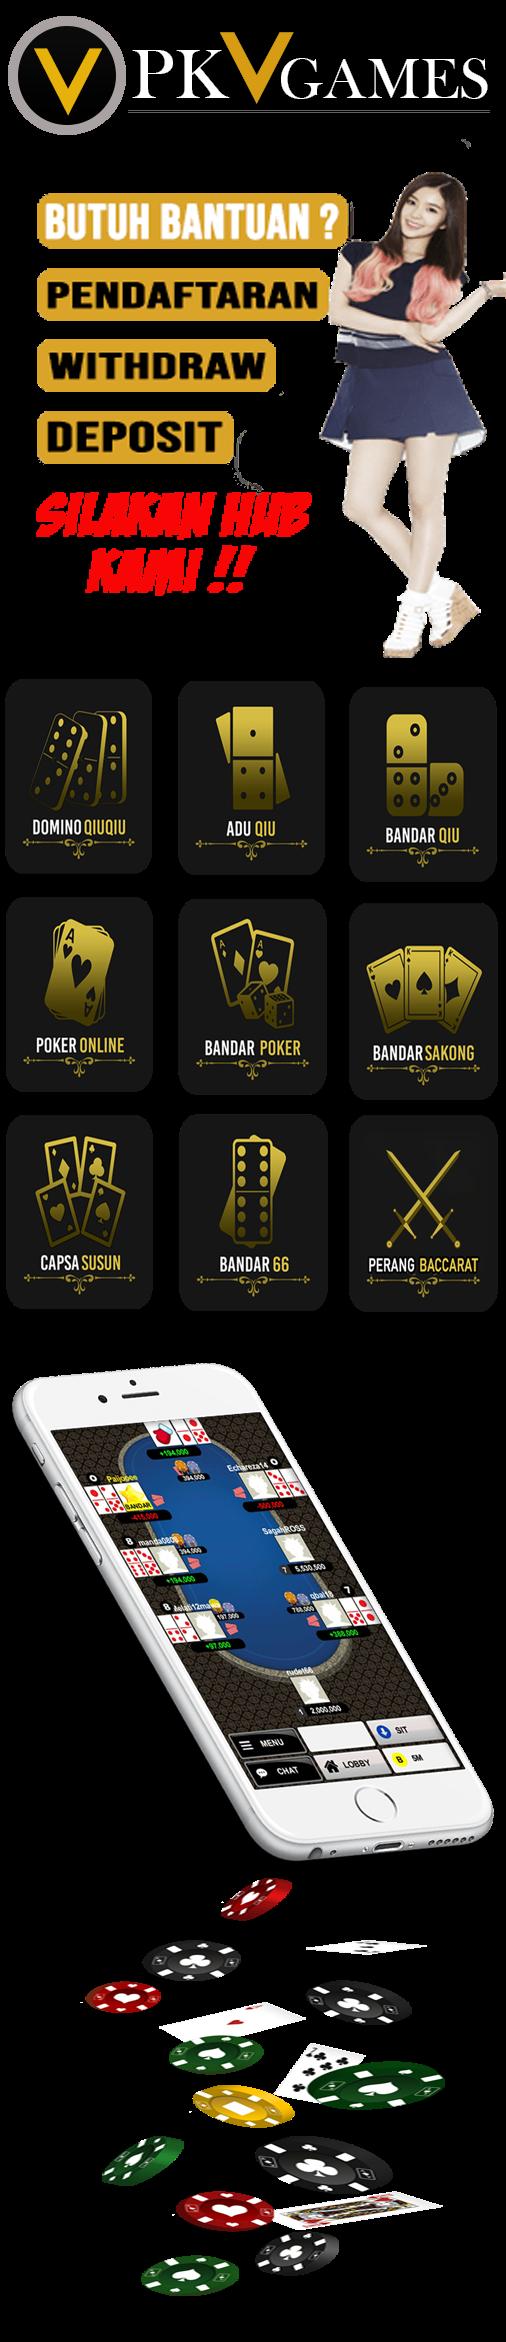 Damqq Situs Poker Online Judi Online Bandarq